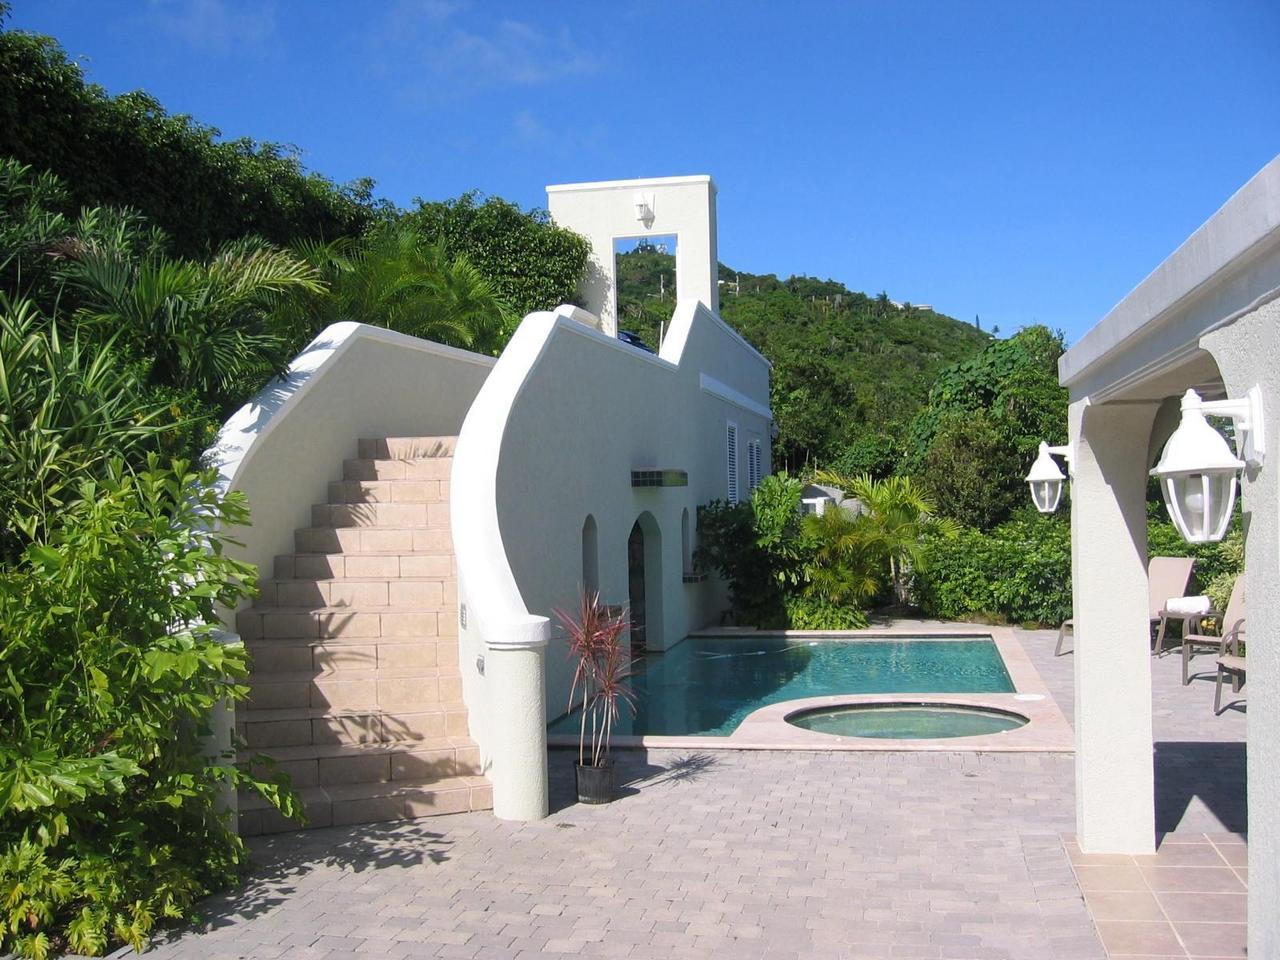 Single Family Home for Rent at 4B-1 Misgunst GNS 4B-1 Misgunst GNS St Thomas, Virgin Islands 00802 United States Virgin Islands